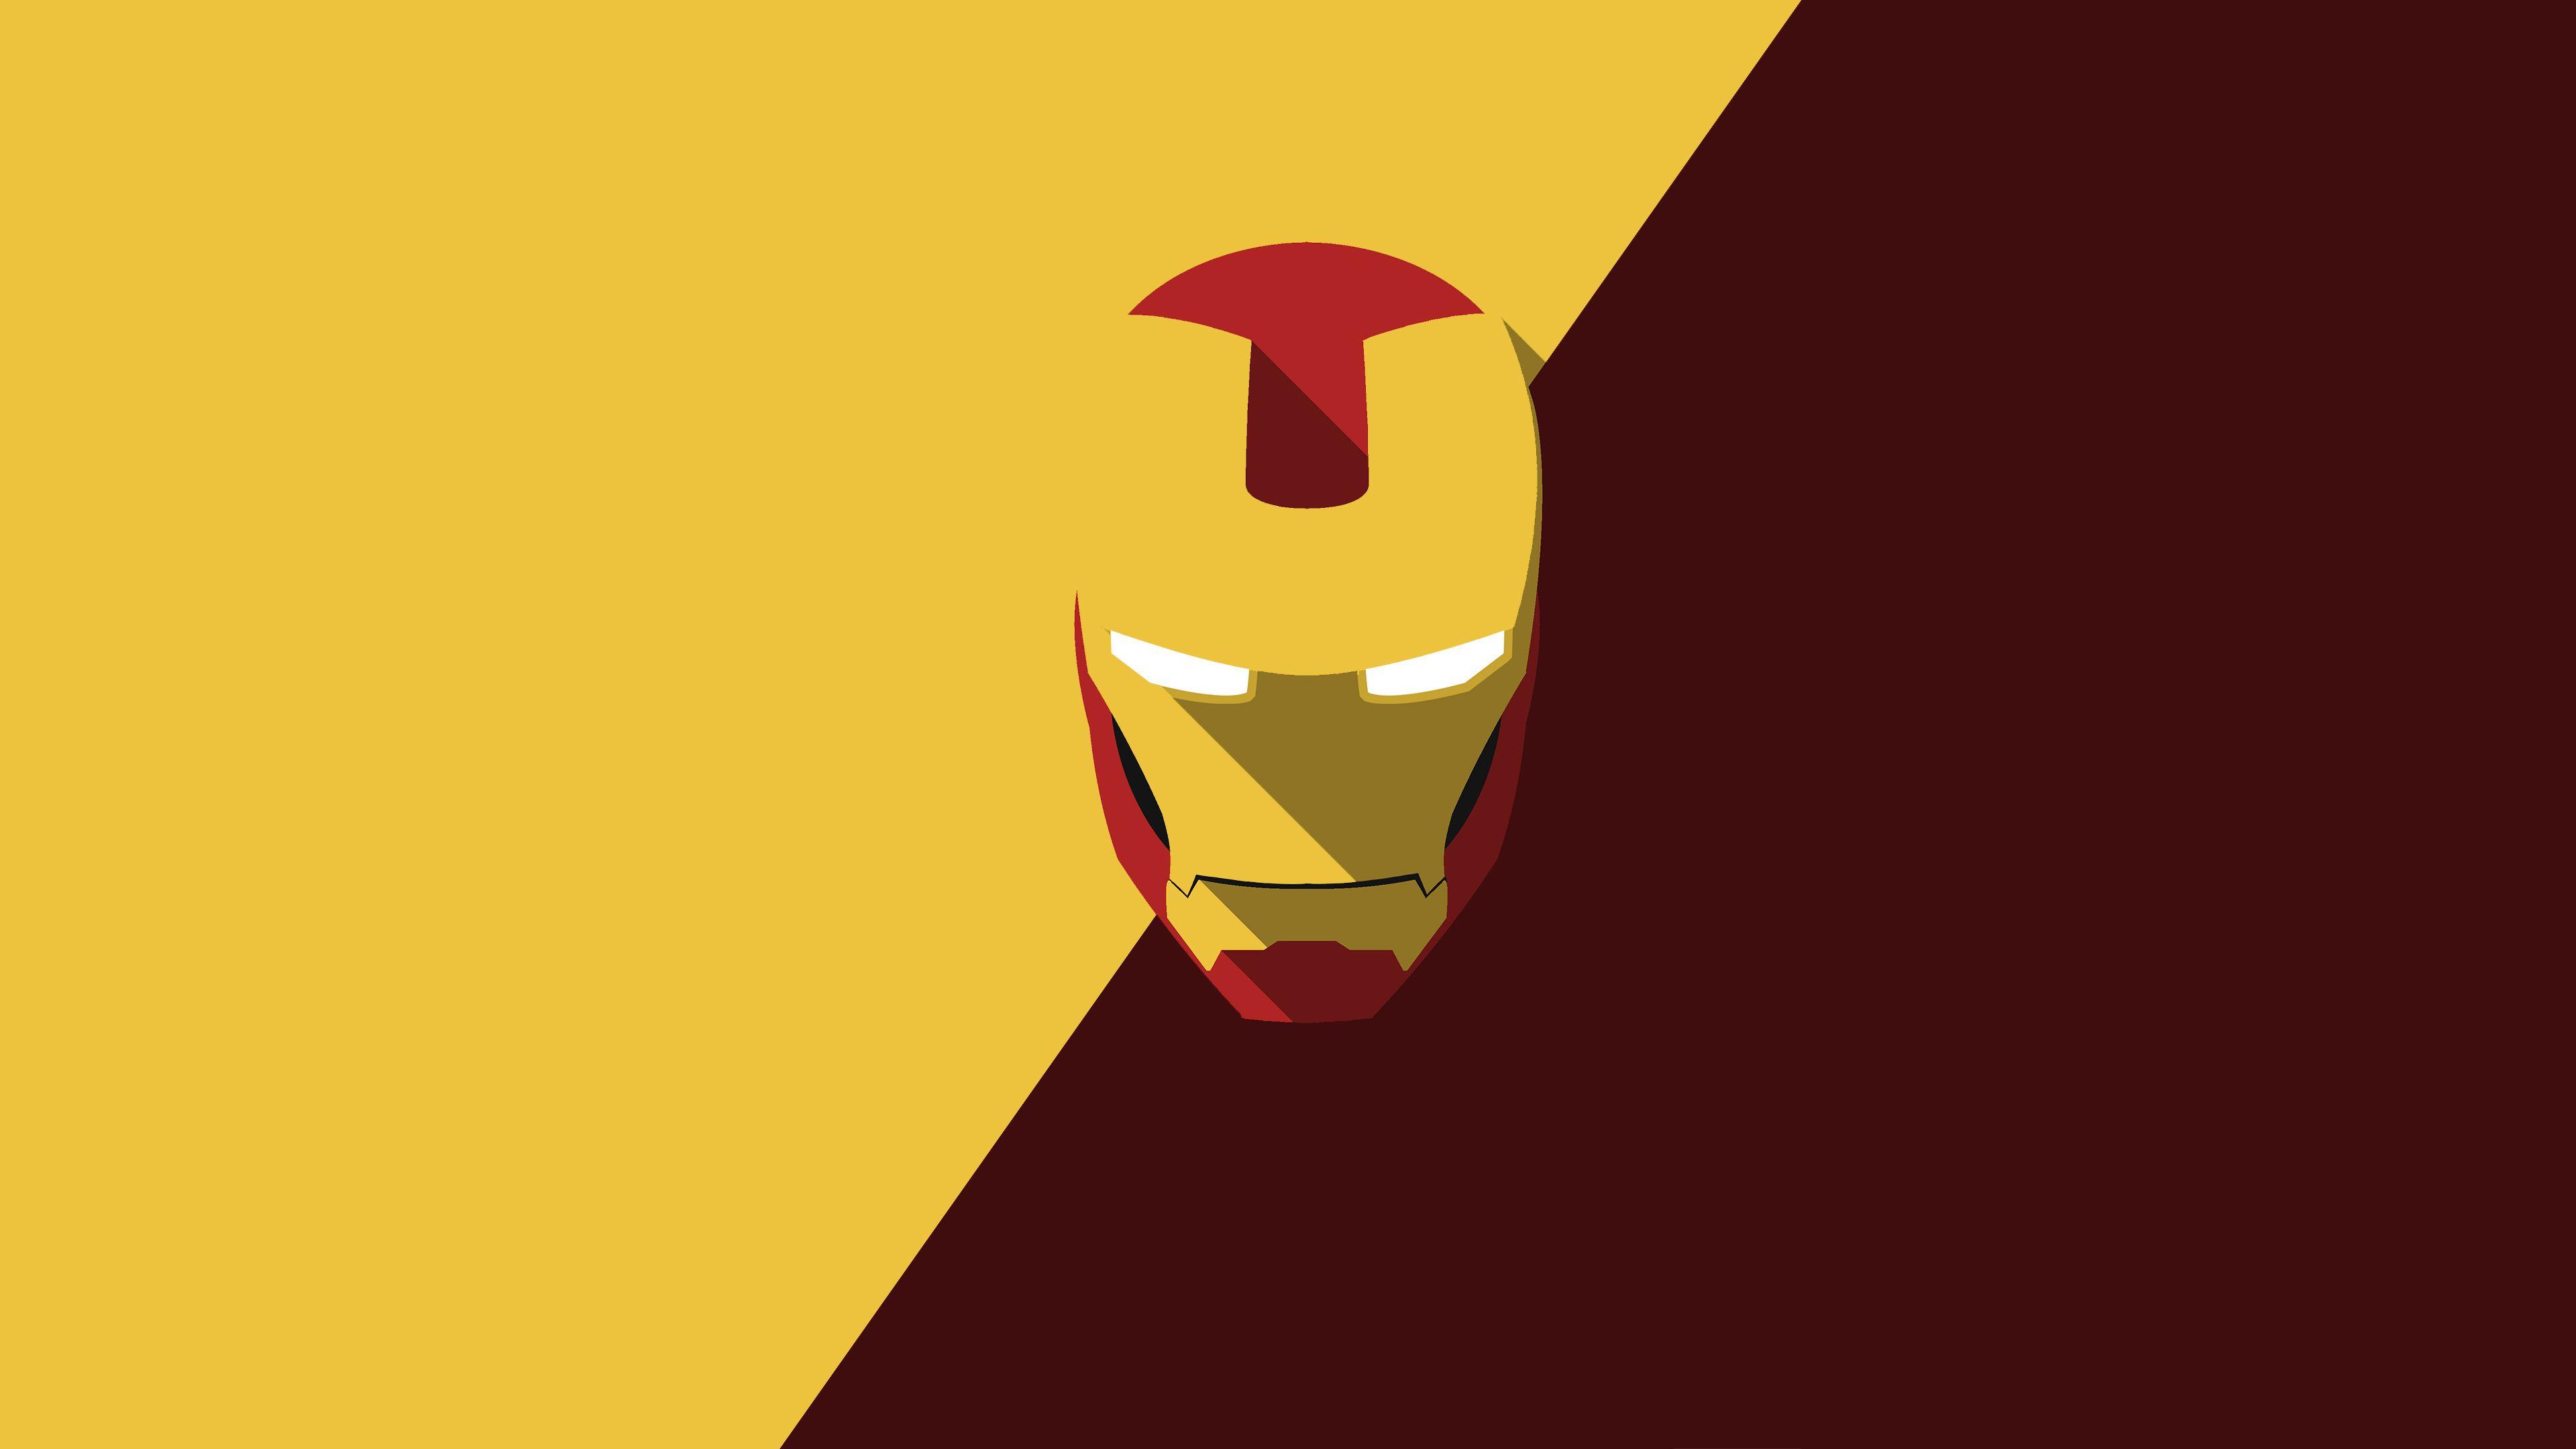 Iron Man Minimal 4k Superheroes Wallpapers Minimalist Wallpapers Minimalism Wallpapers Iron Man Wallpa Iron Man Wallpaper Man Wallpaper Minimalist Wallpaper